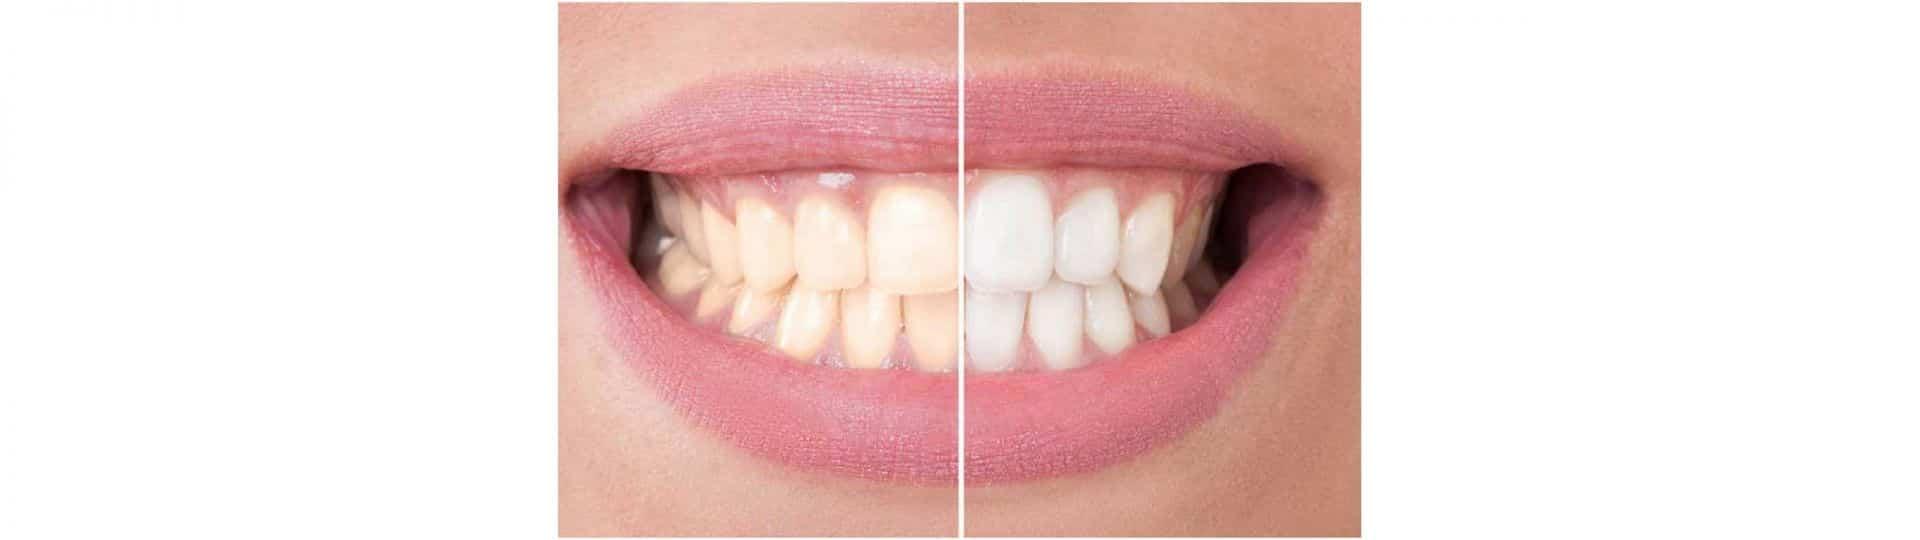 laser in odontoiatria sbiancamento dentale